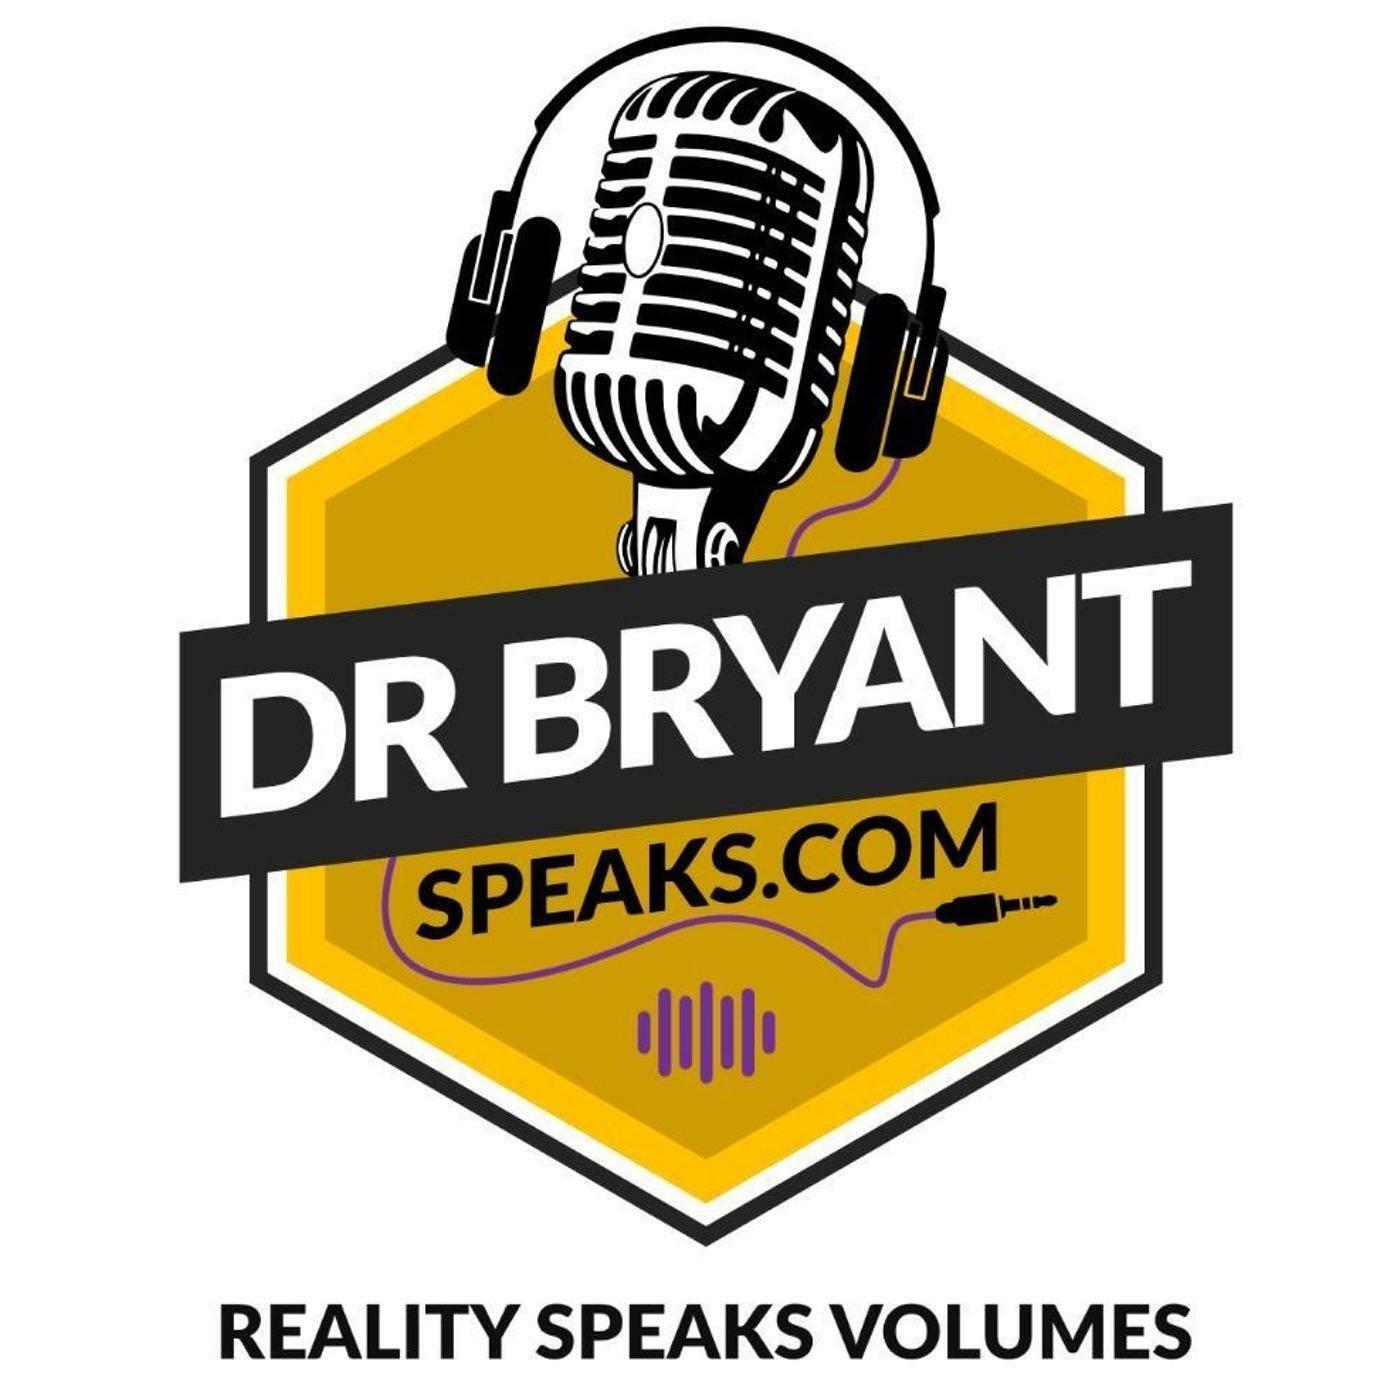 Dr Bryant Speaks.com